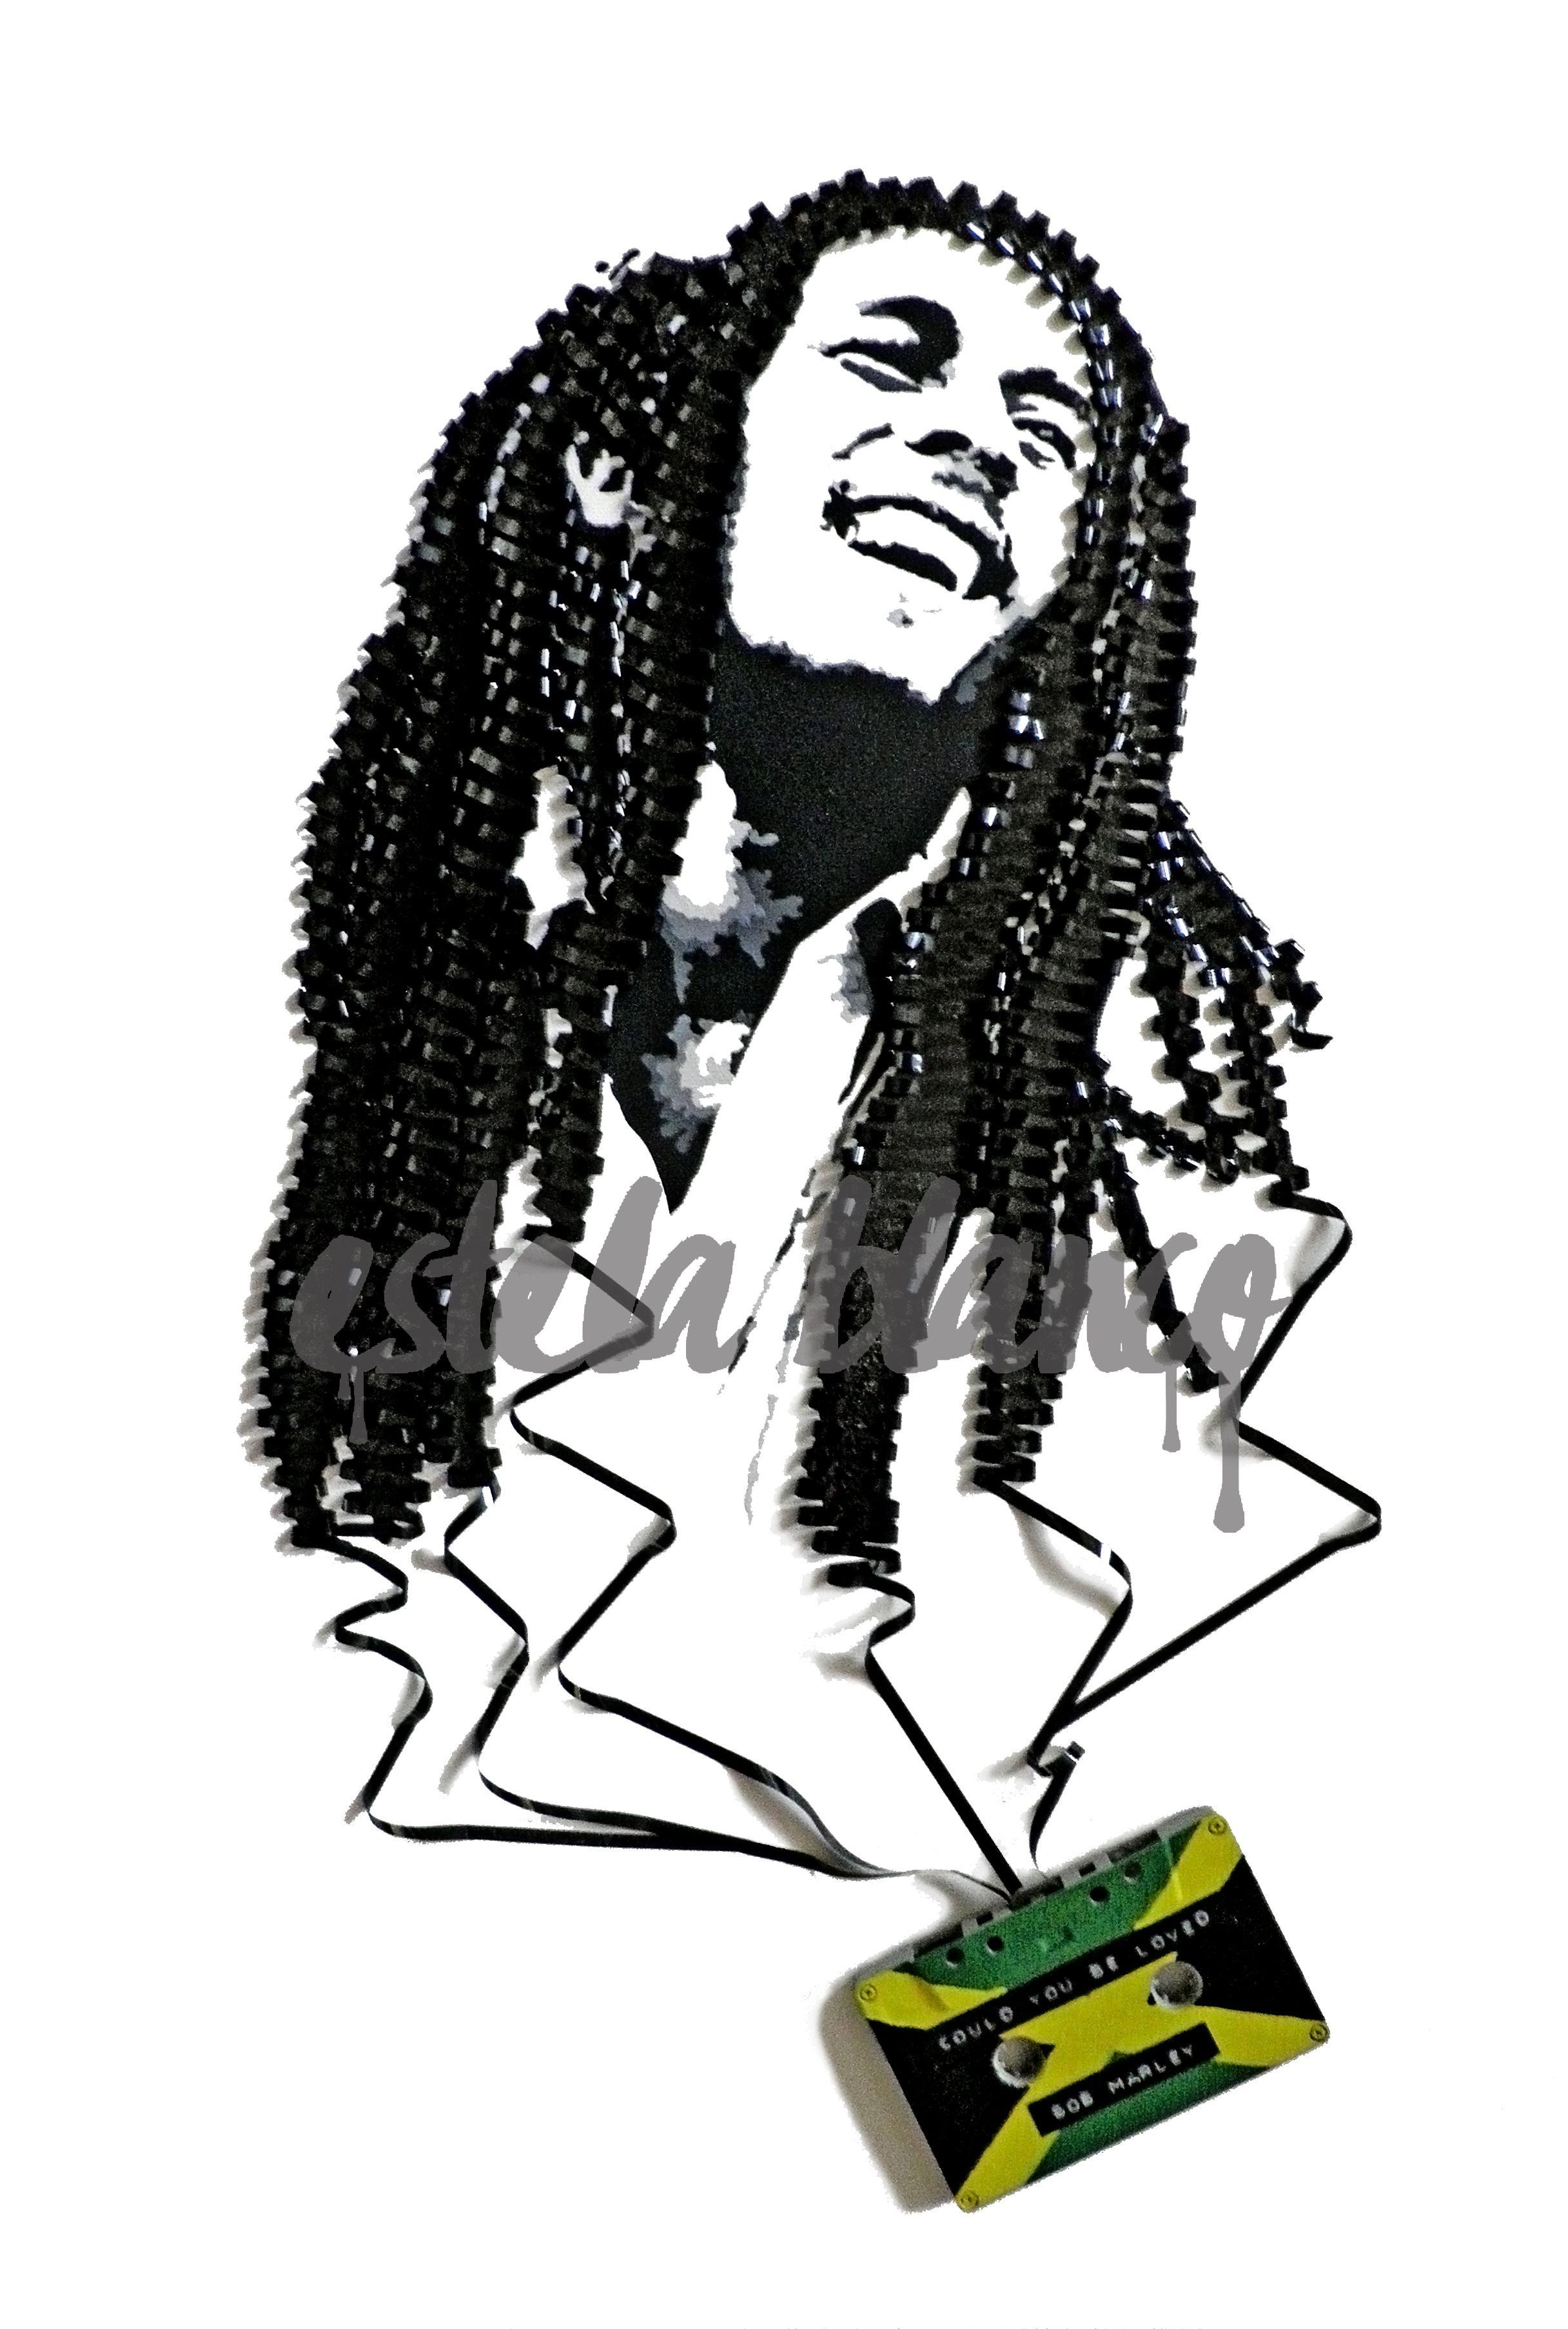 Pin by Estela Blanco on My Cassette Art